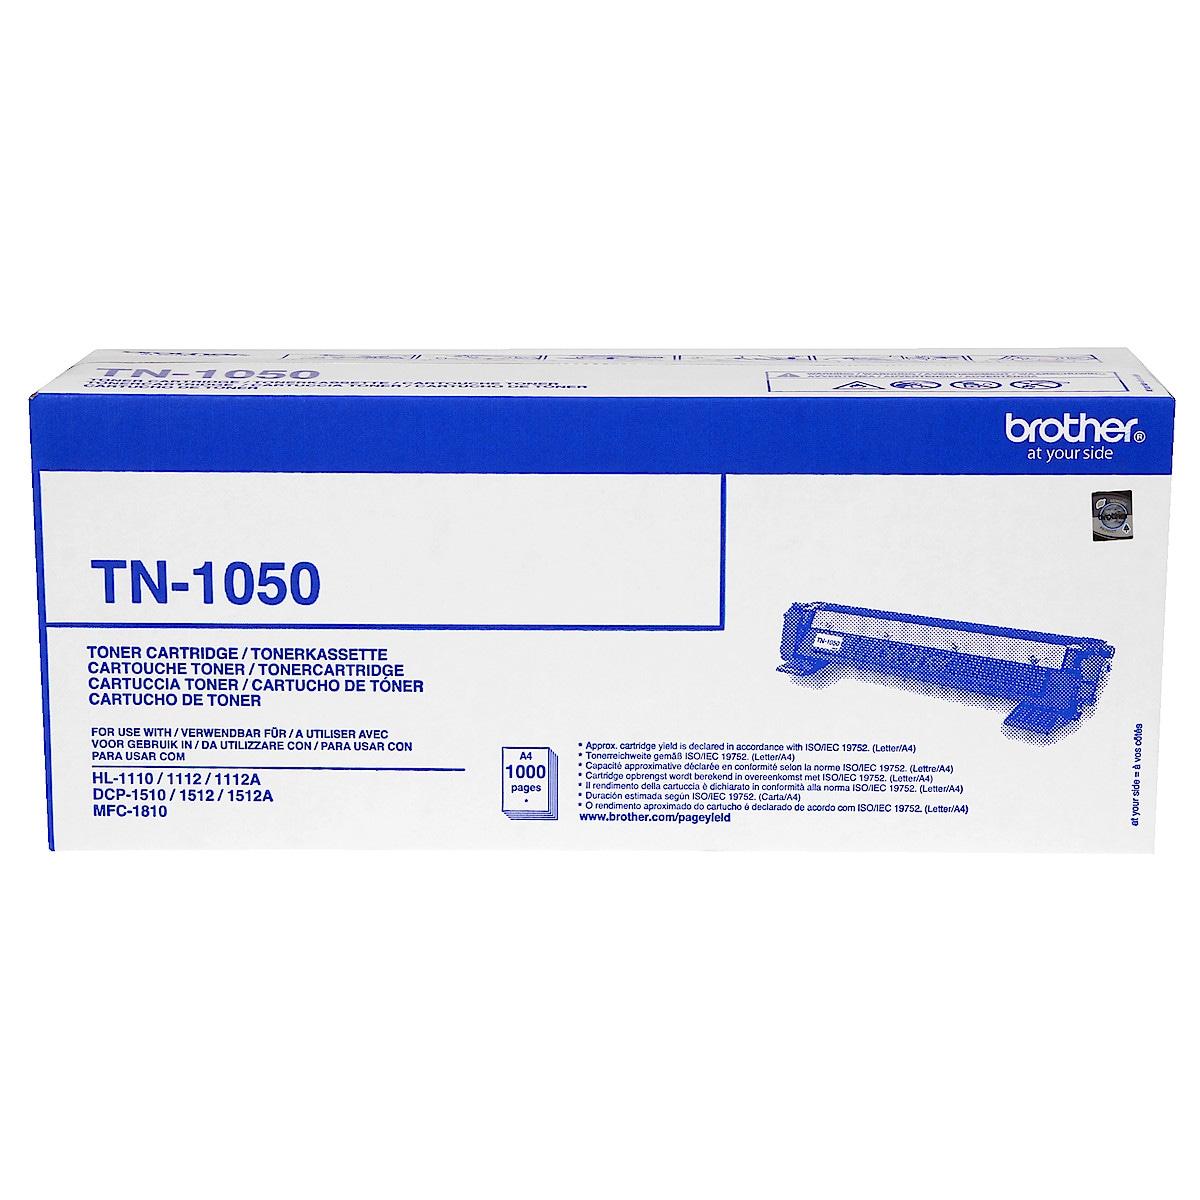 Toner Brother TN-1050